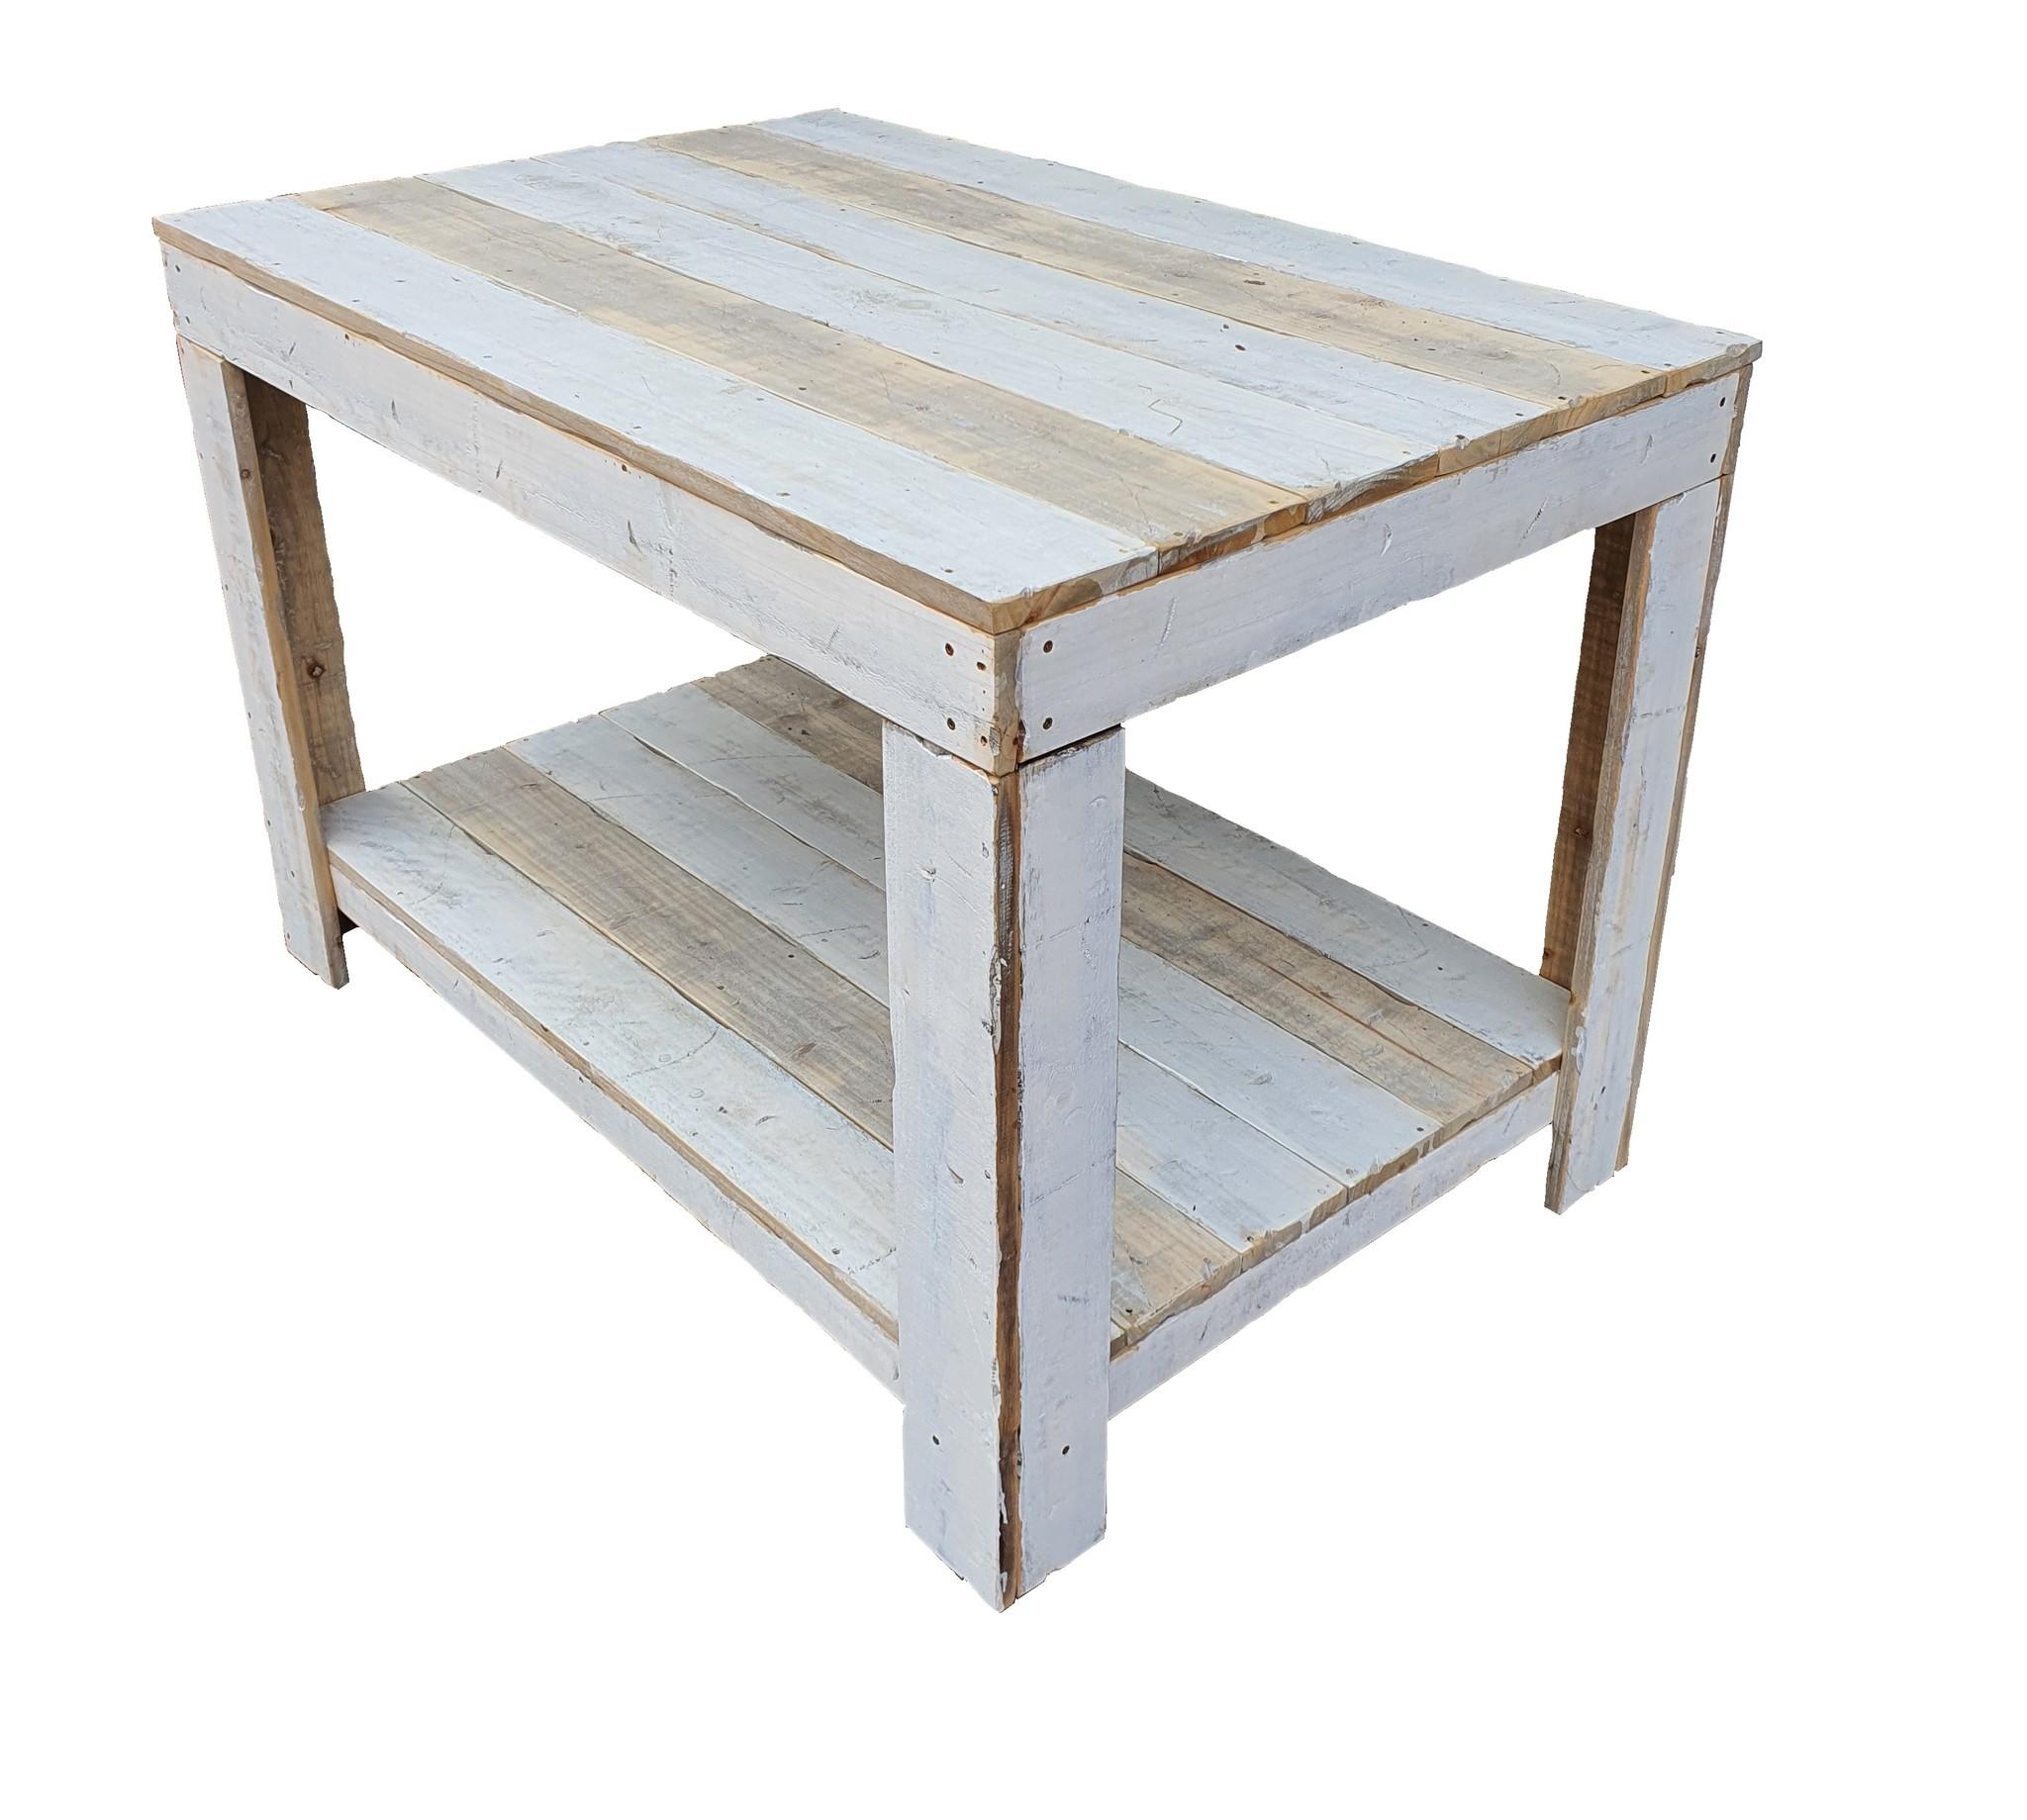 shop int ibiza white table double 110-1